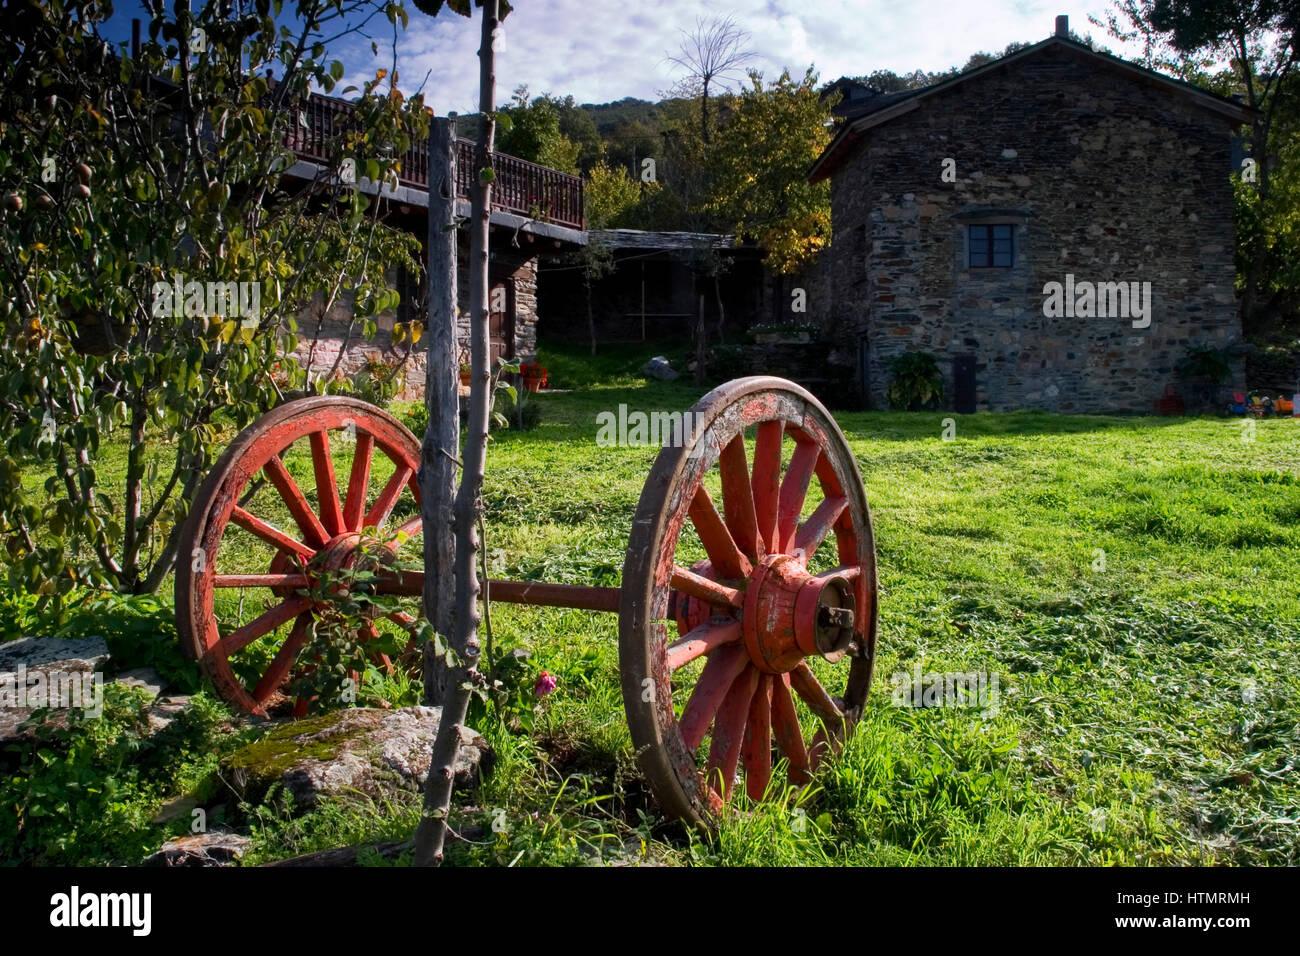 Voces village. El Bierzo, Leon. Spain, Europe - Stock Image